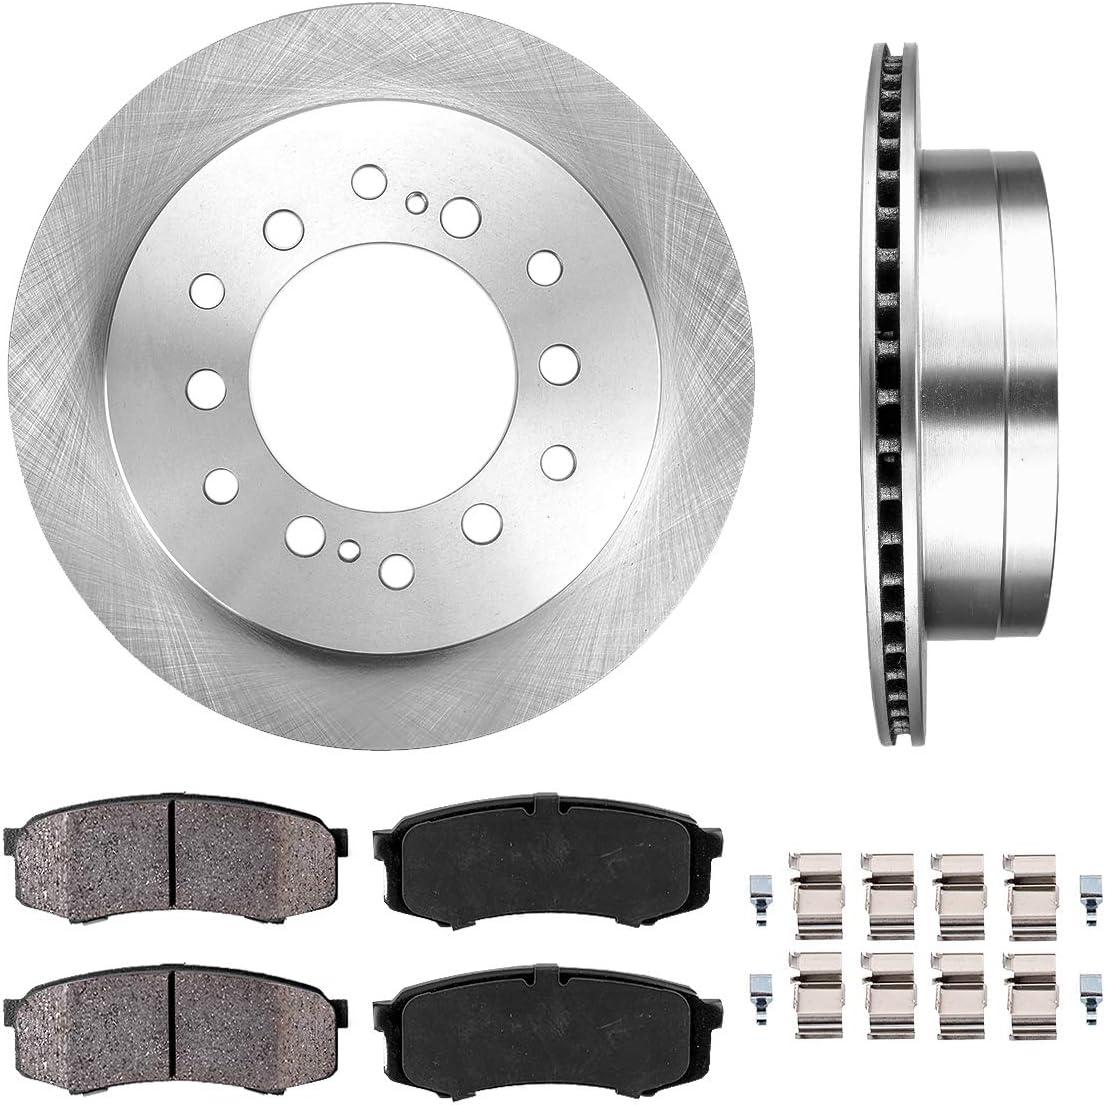 Front Rotors w//Metallic Pad OE Brakes 2003-2009 GS470 4Runner